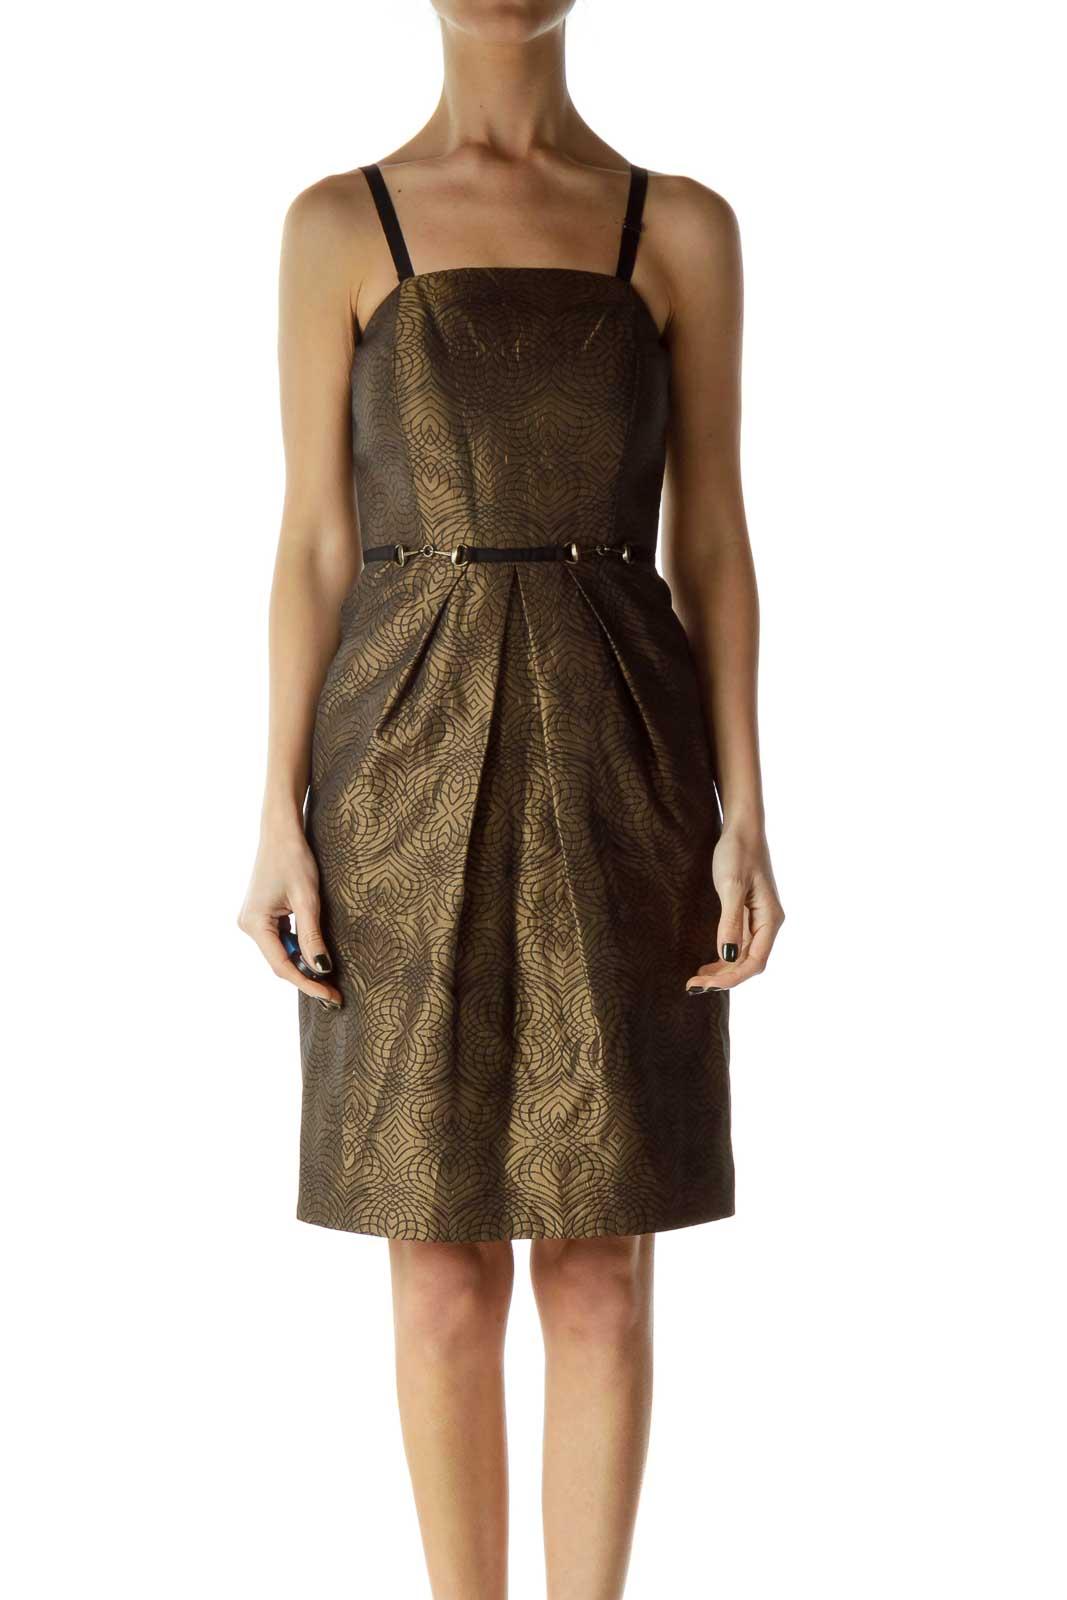 Brown Metallic Printed Cocktail Dress Front